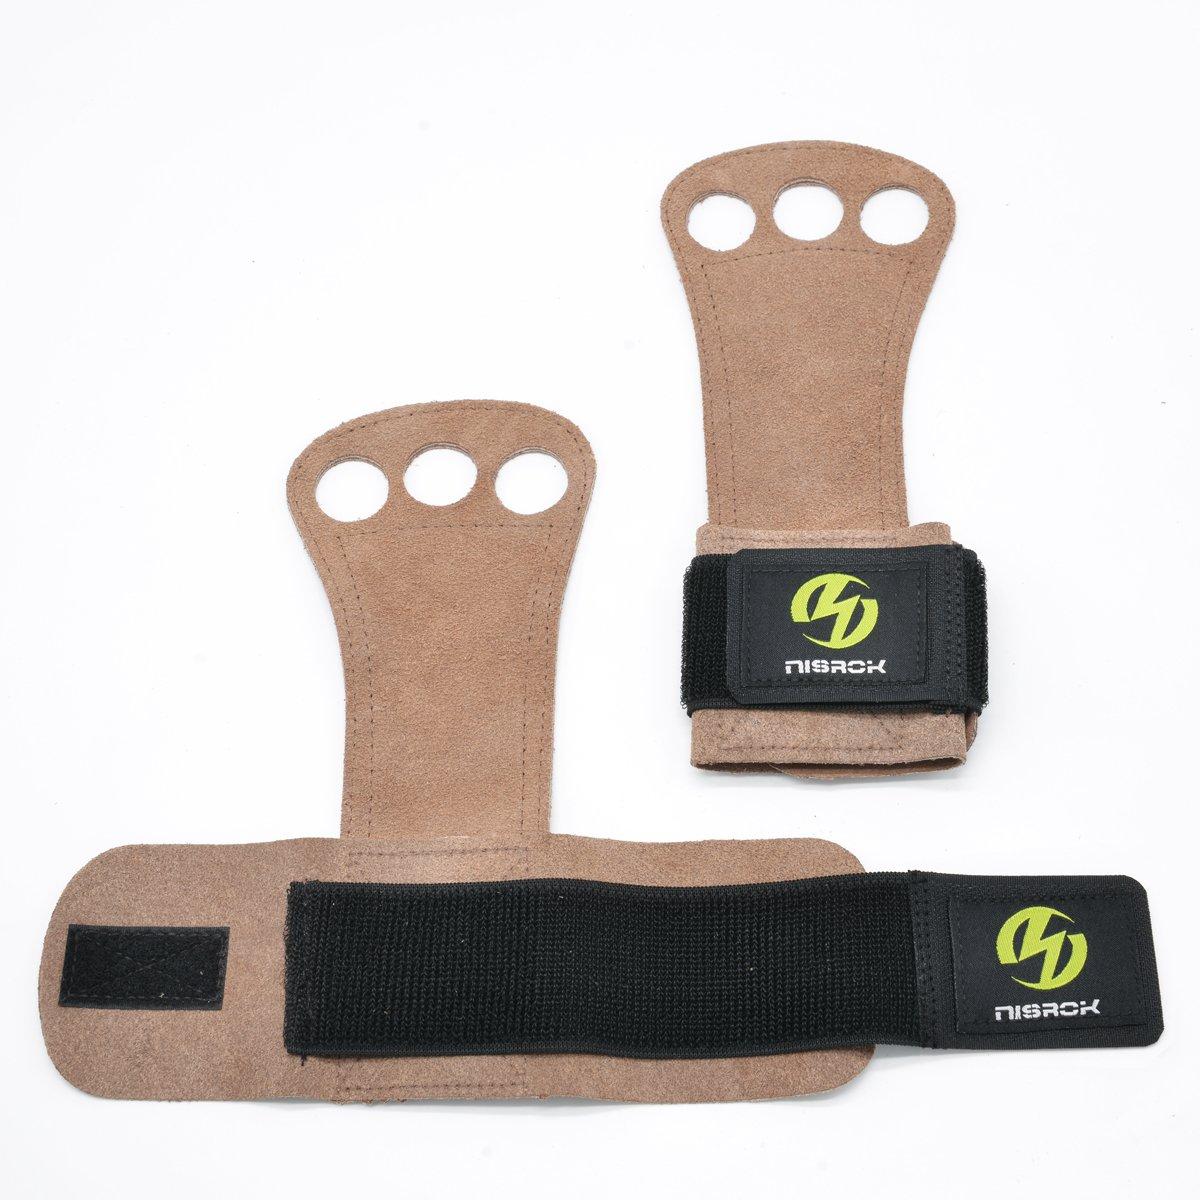 Weightlfting,Powerlifting,Barbells,Kettlebells Nisrok Gymnastics Hand Grips Free Carrying Bag Crossfit Gloves Great for Pull Ups,Cross Training